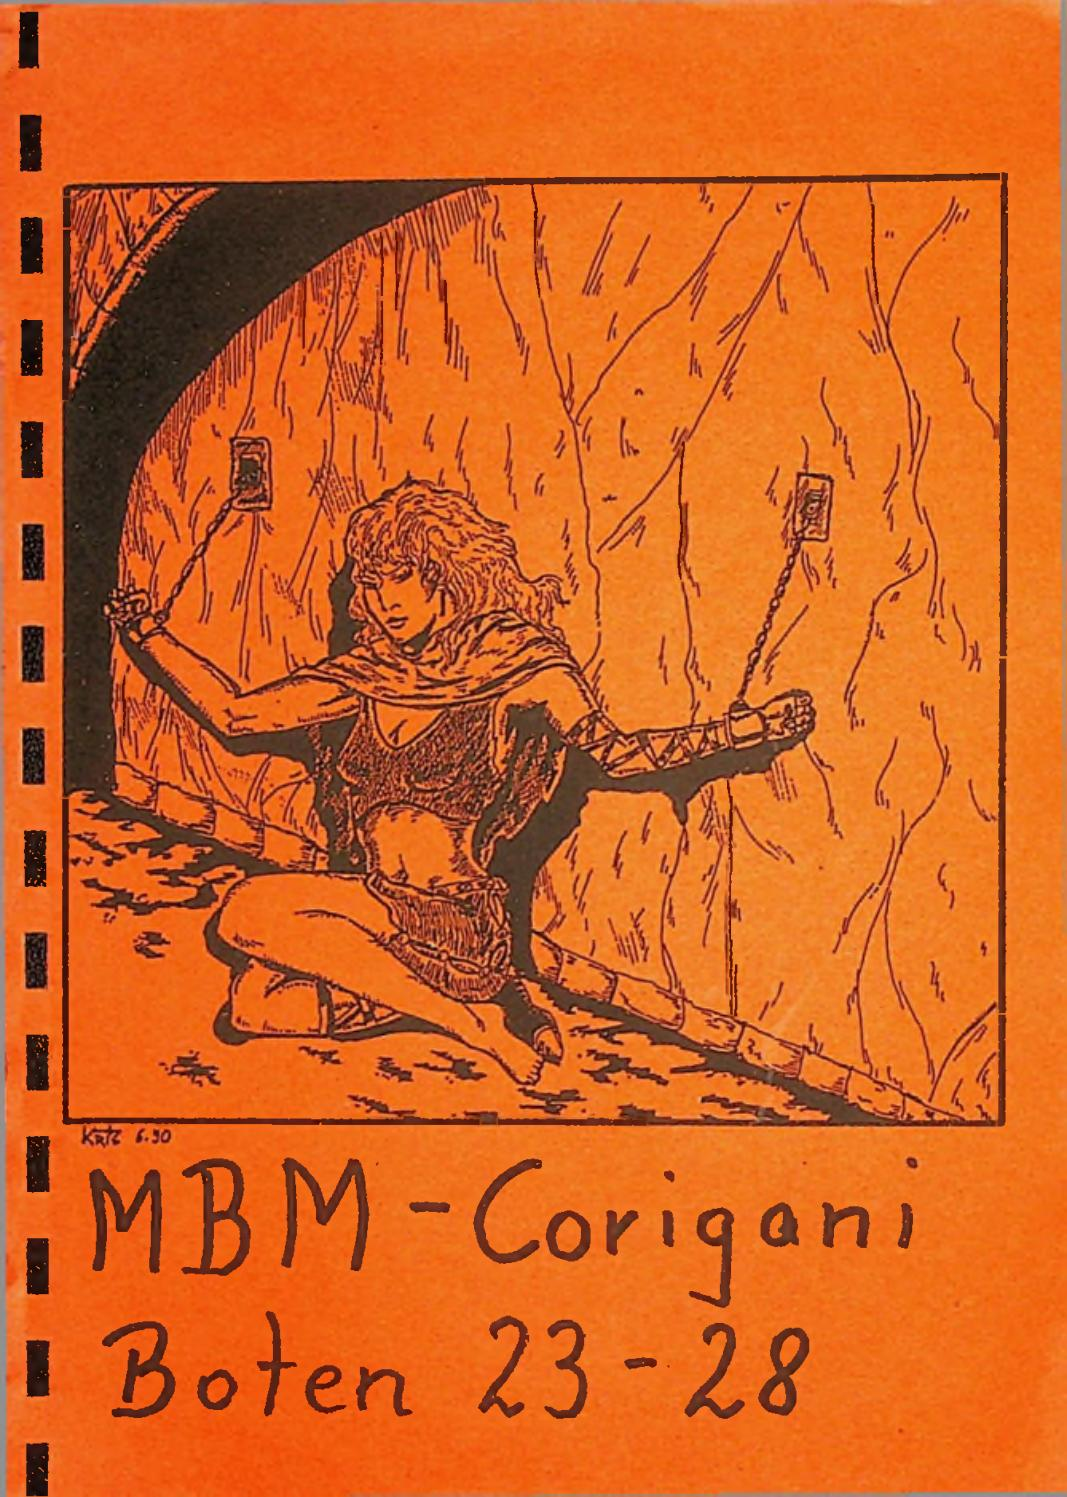 MBM Bote von Corigani 21 21 by Projekt Myra   issuu